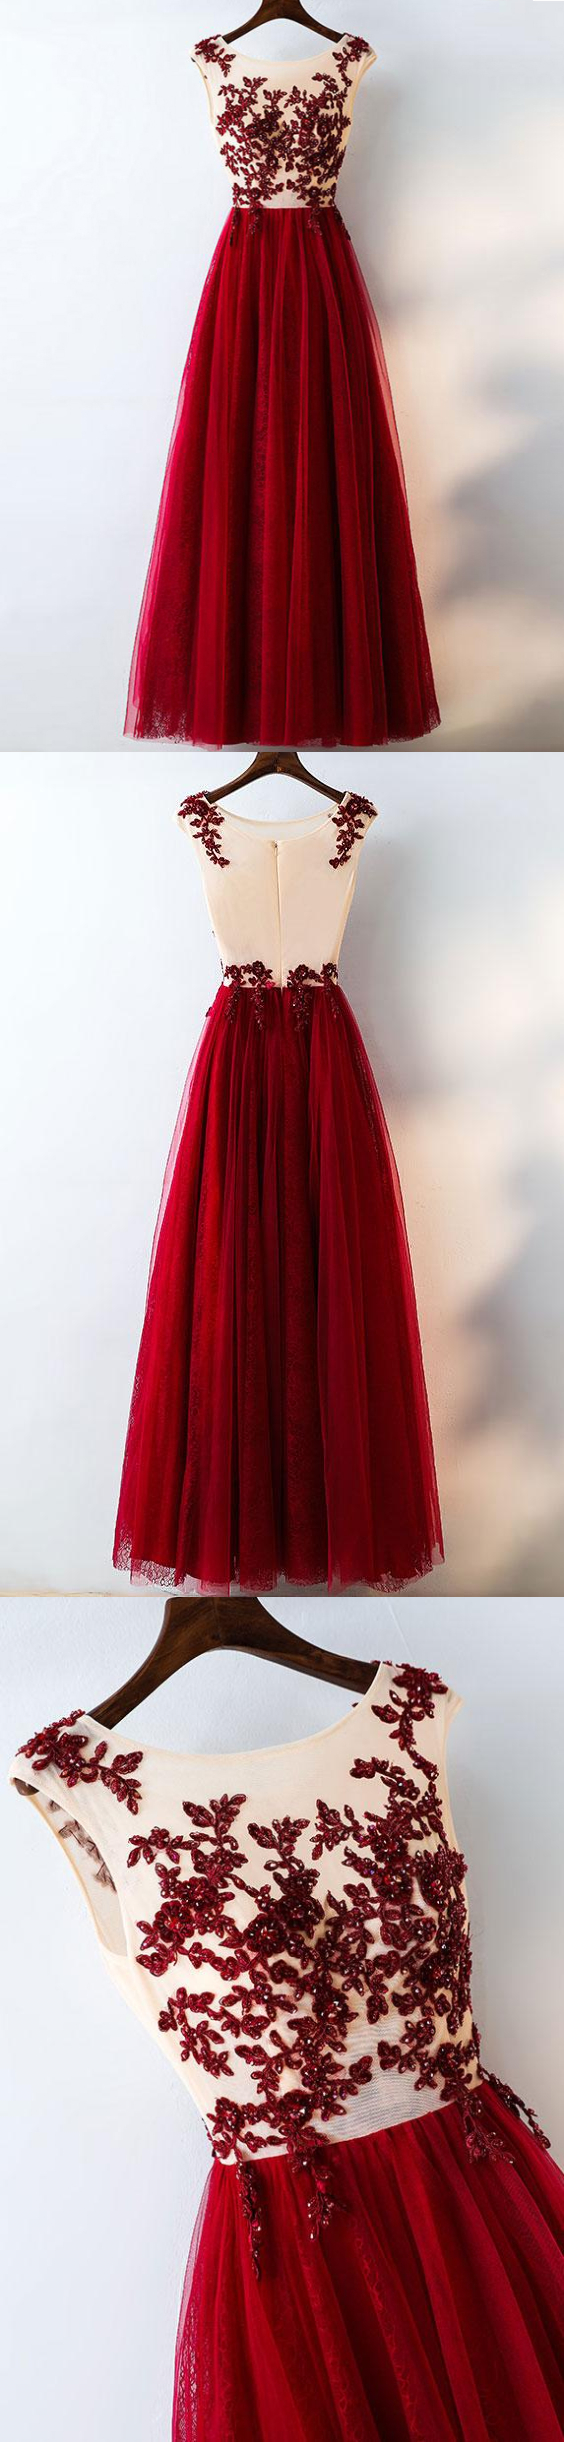 Chic burgundy prom dresses rhinestone scoop floorlength lace prom